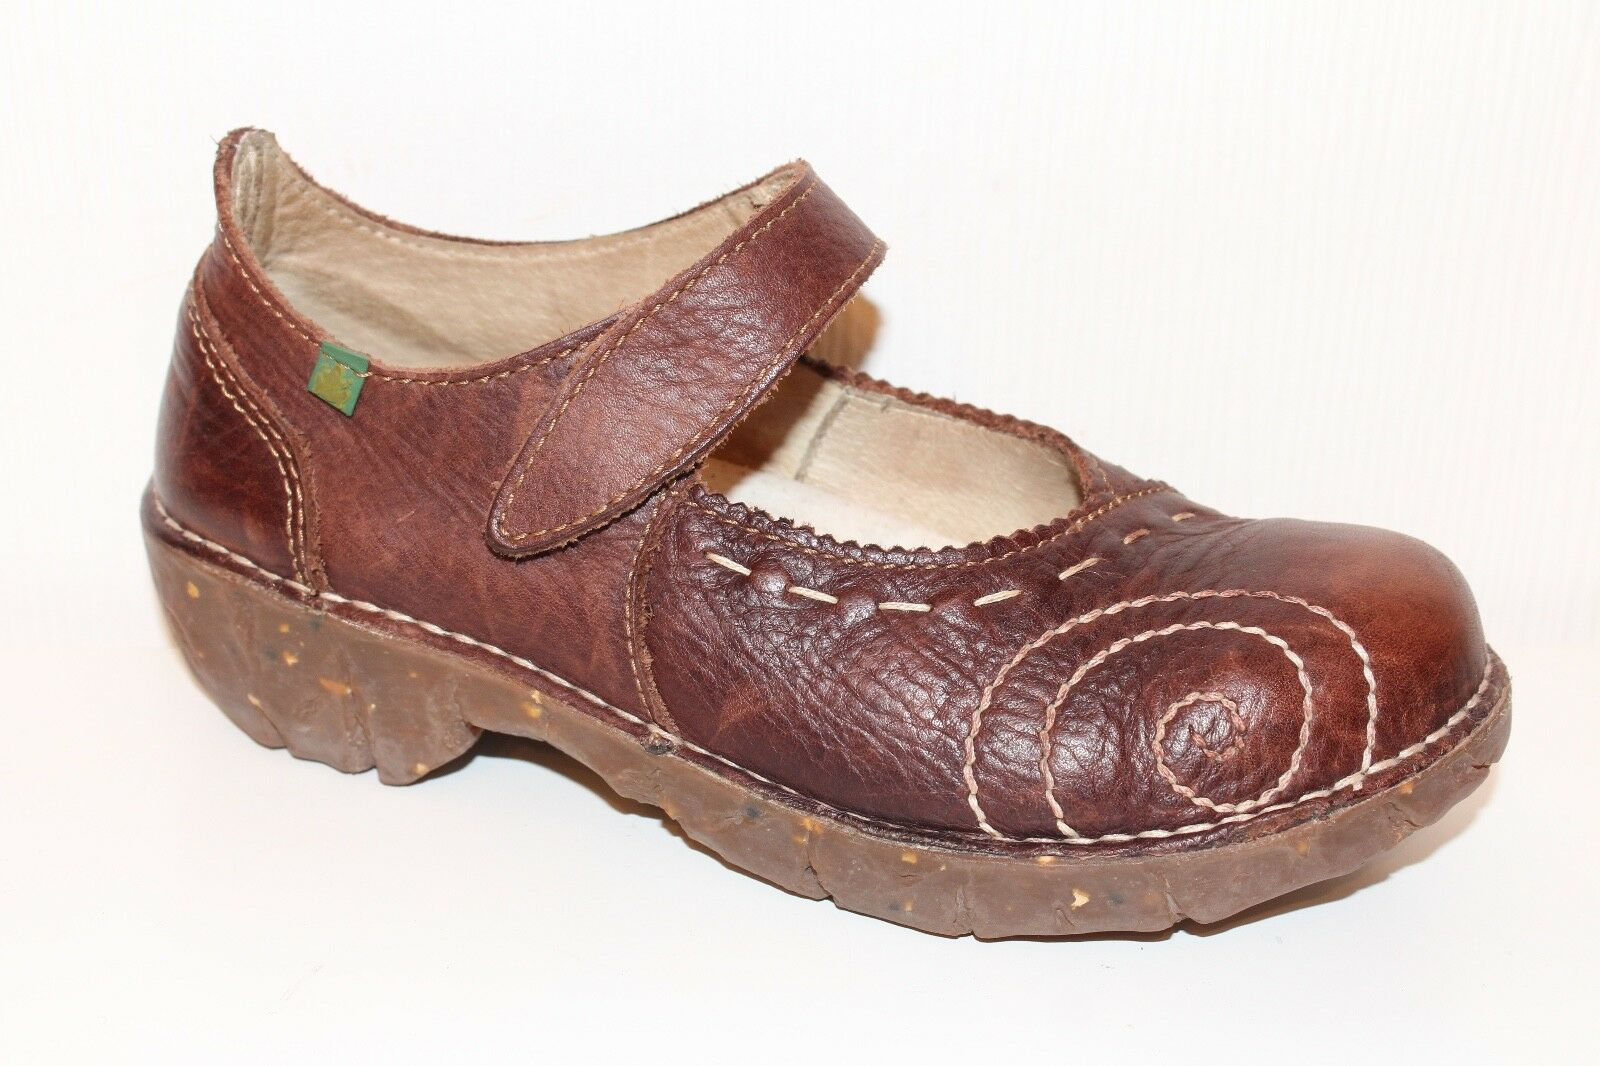 El Naturalista chaussures femmes Cuir Veritable 37 Cognac Bride Ballerine superposé uk4